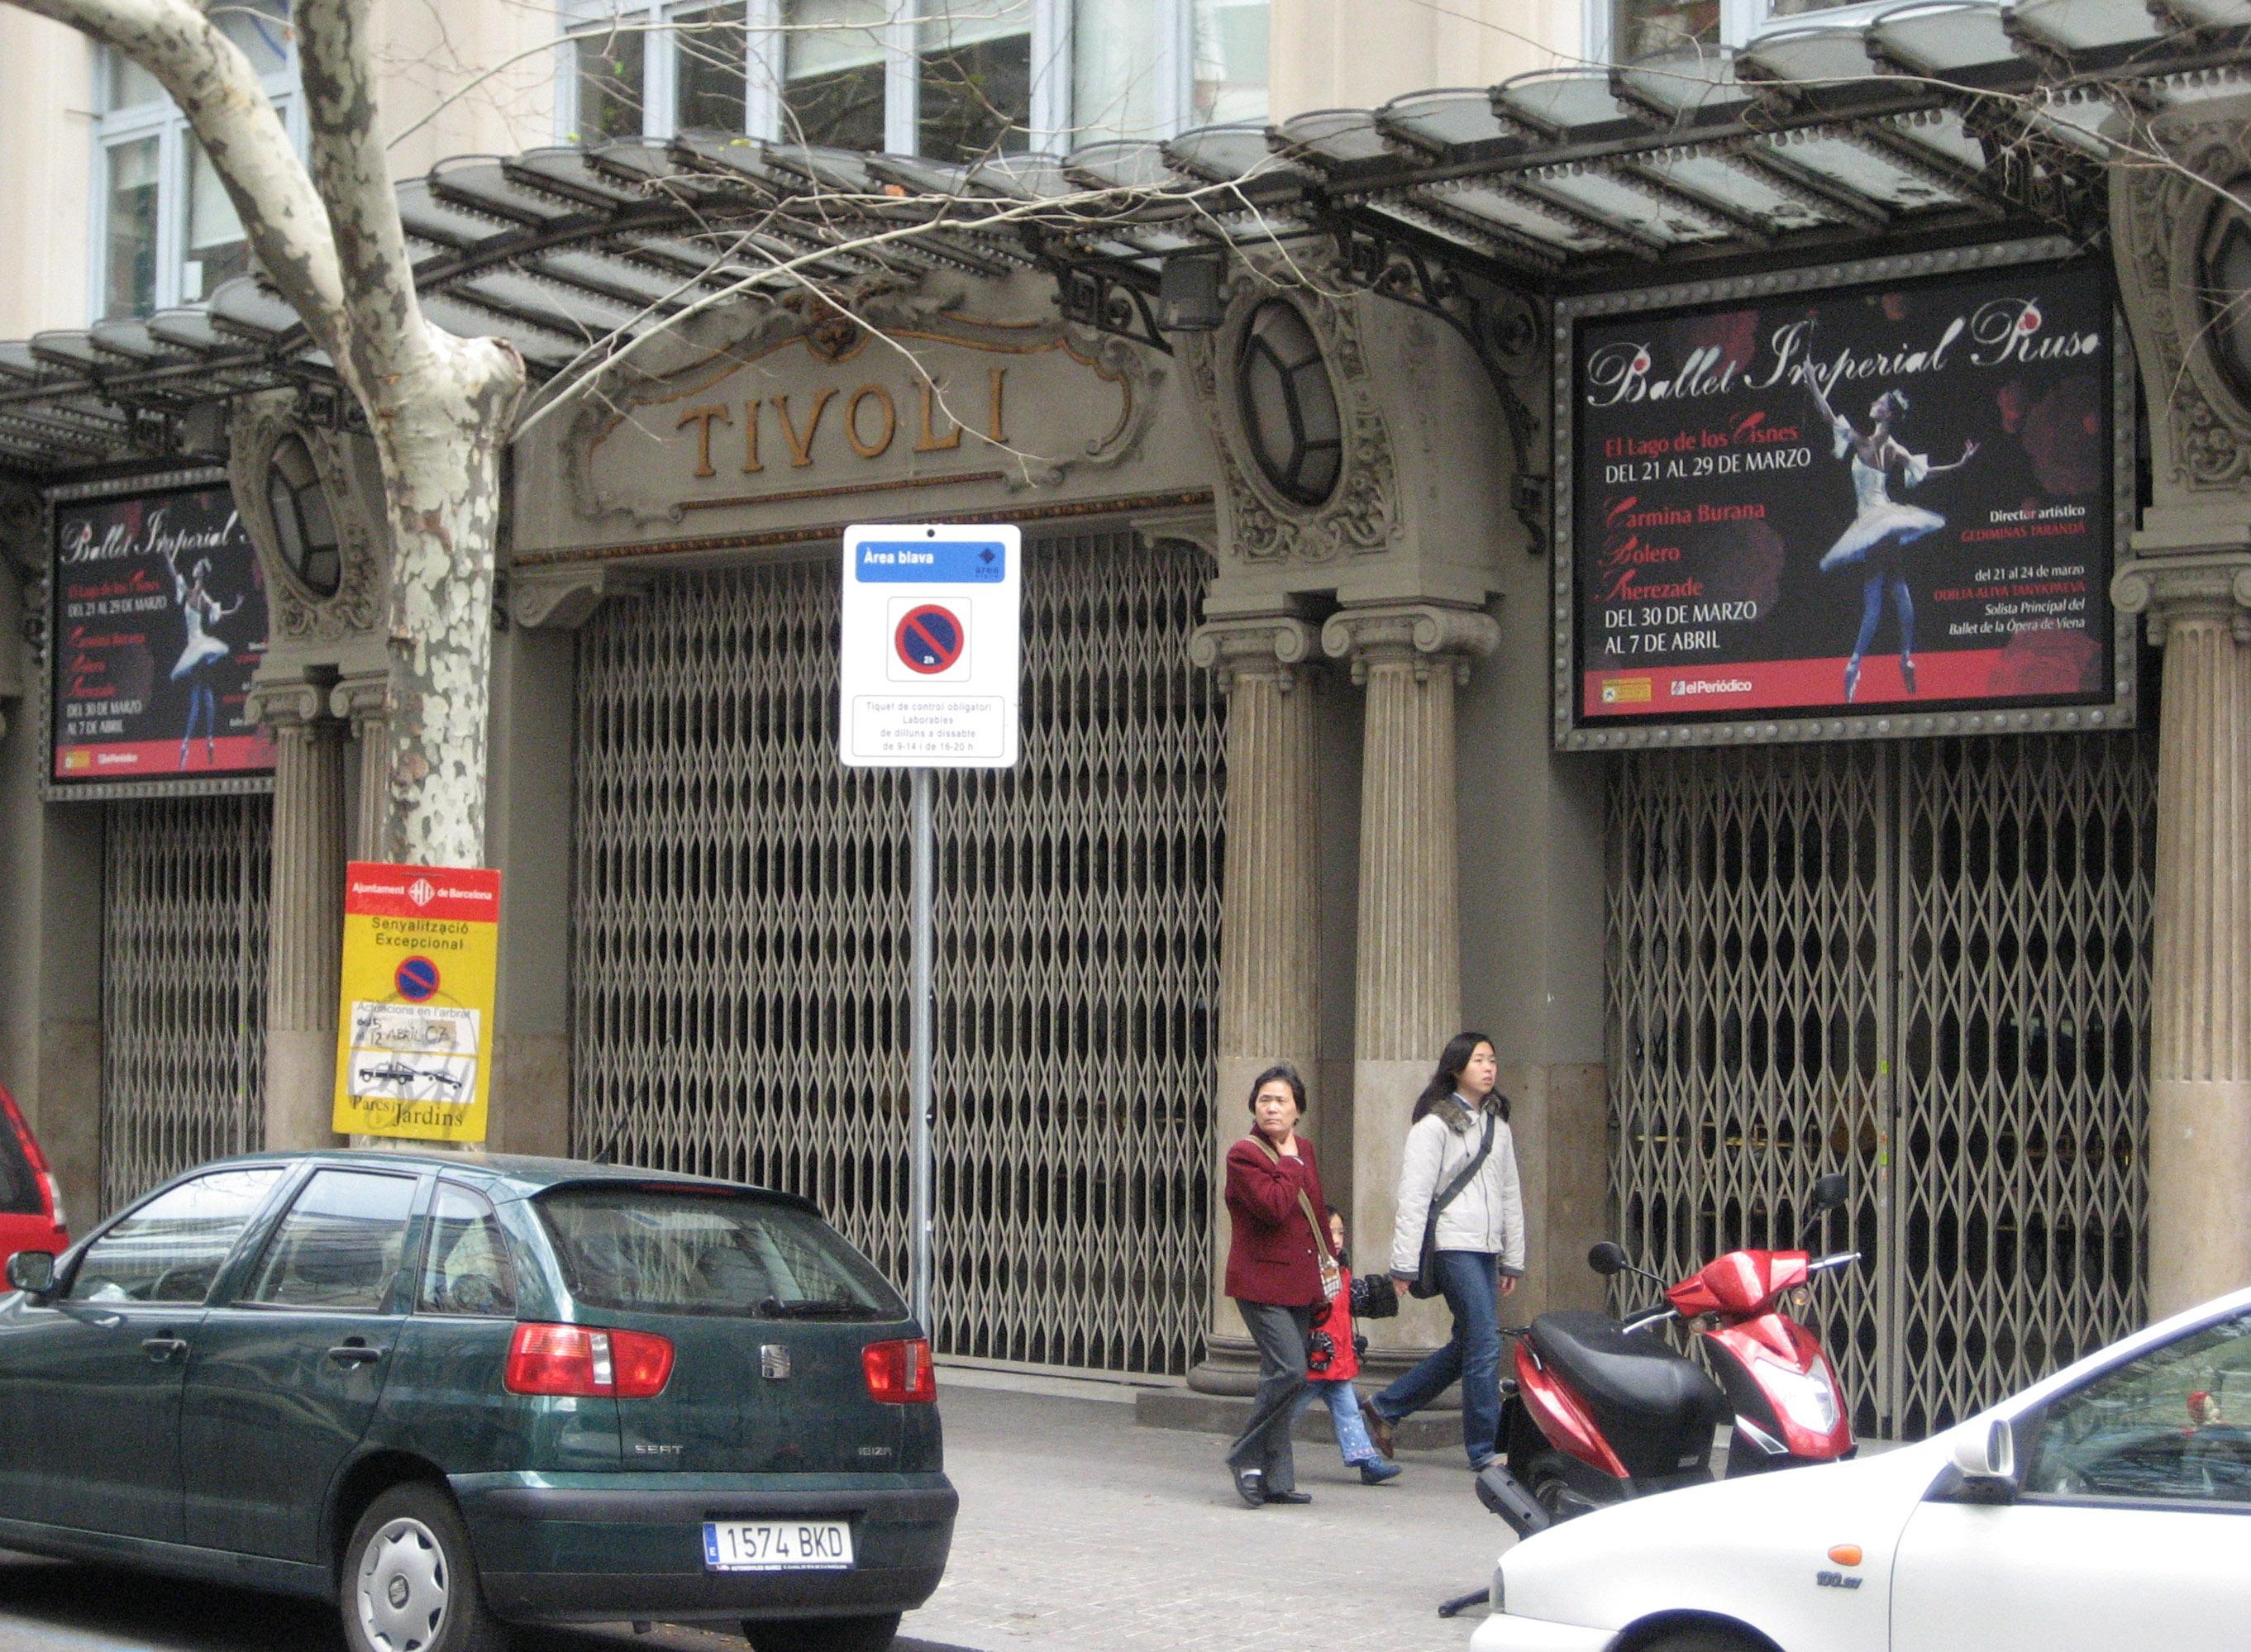 2007_Teatre_T%C3%ADvoli%2C_Barcelona.jpg